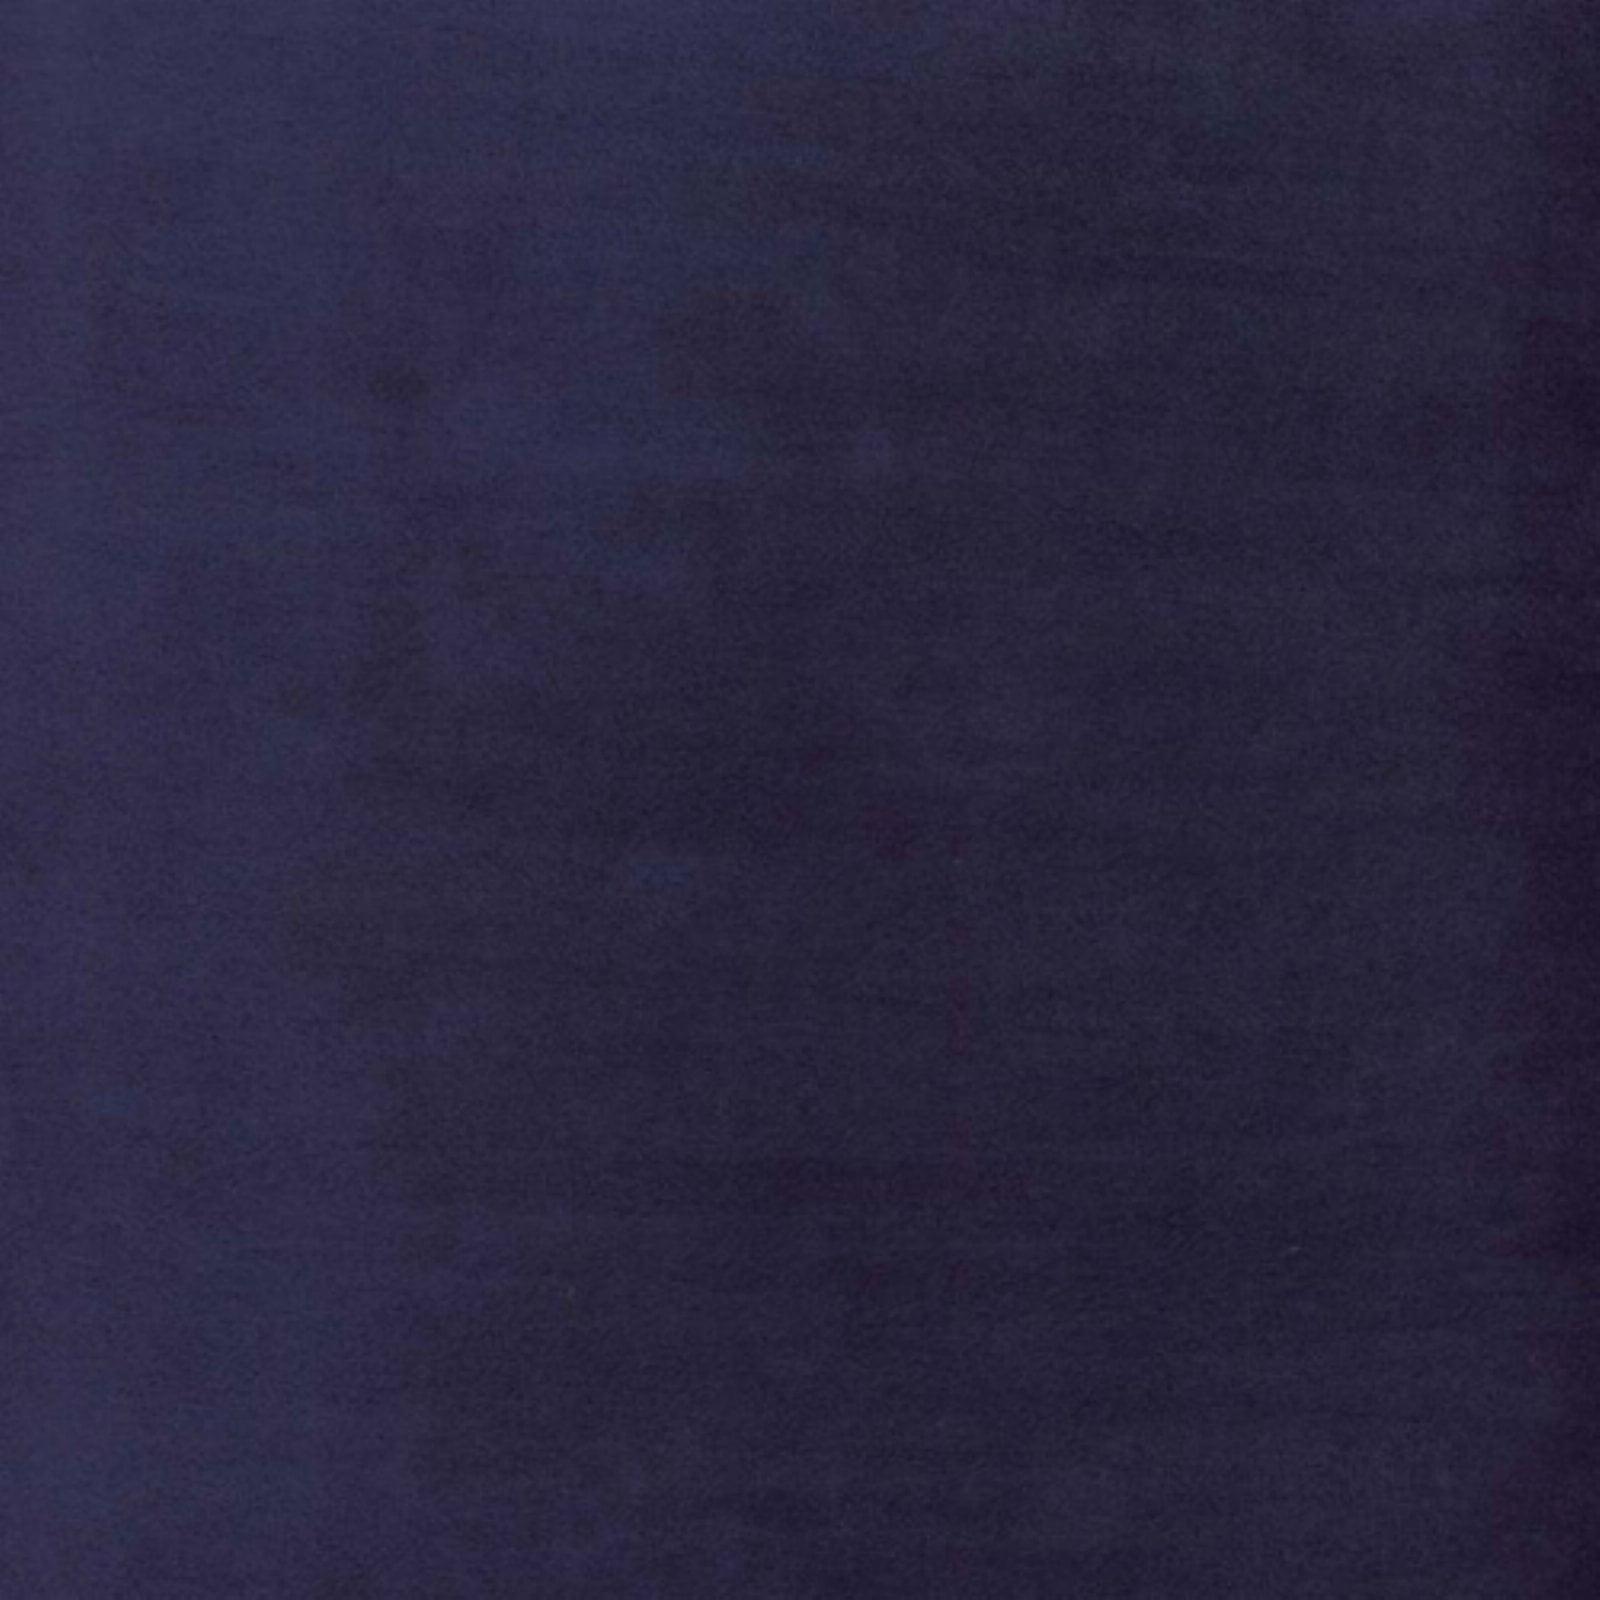 SSI Covers Full Posh Deep Blue Futon Cover